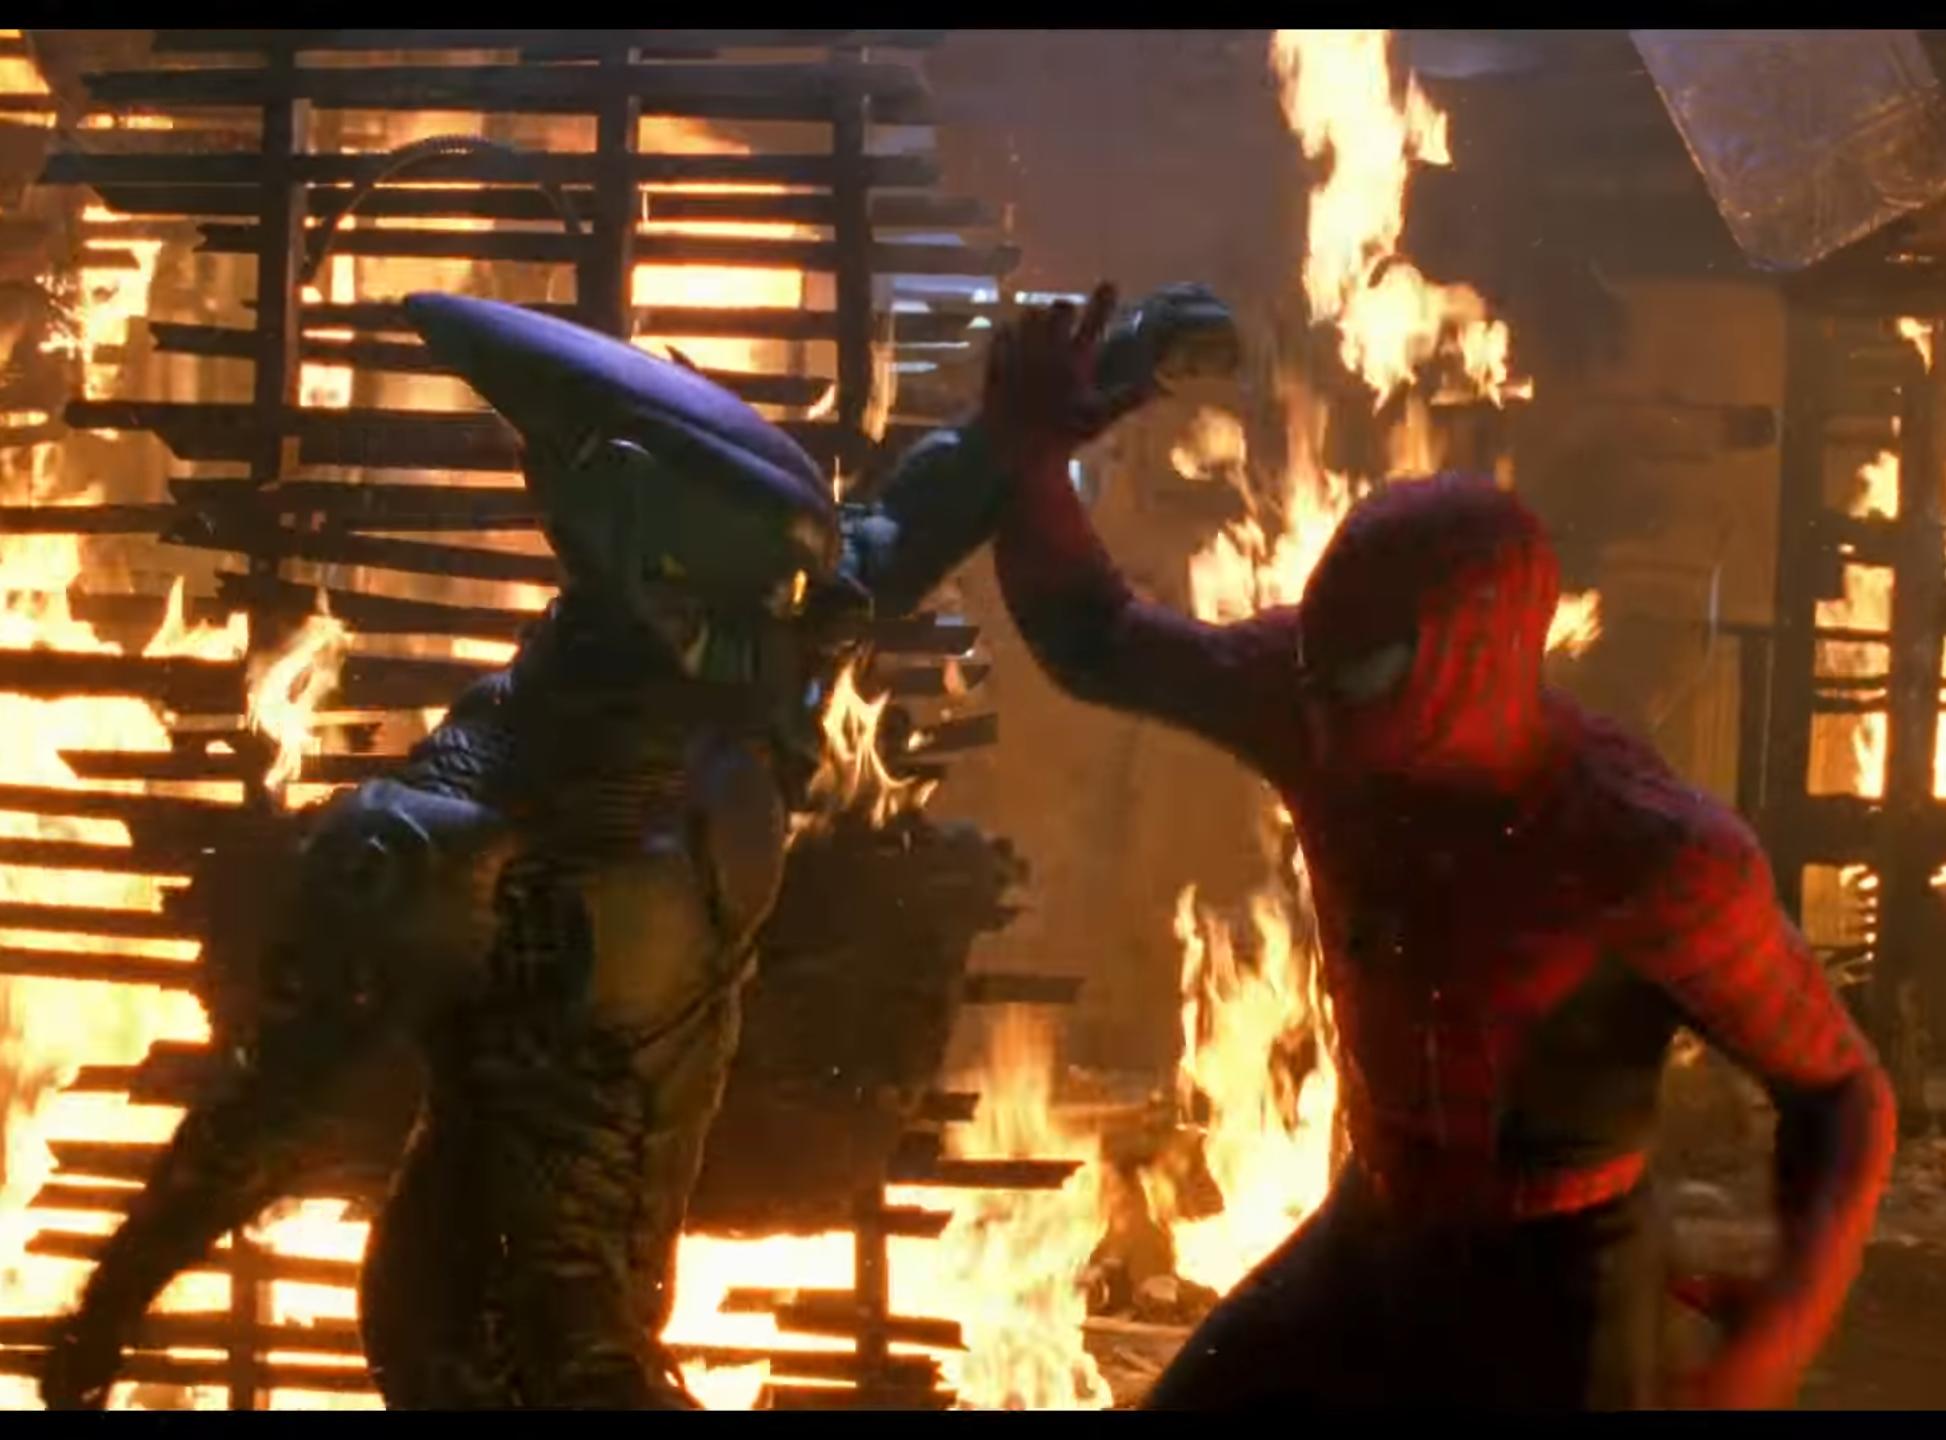 green goblin (willem dafoe) | spider-man films wiki | fandom powered